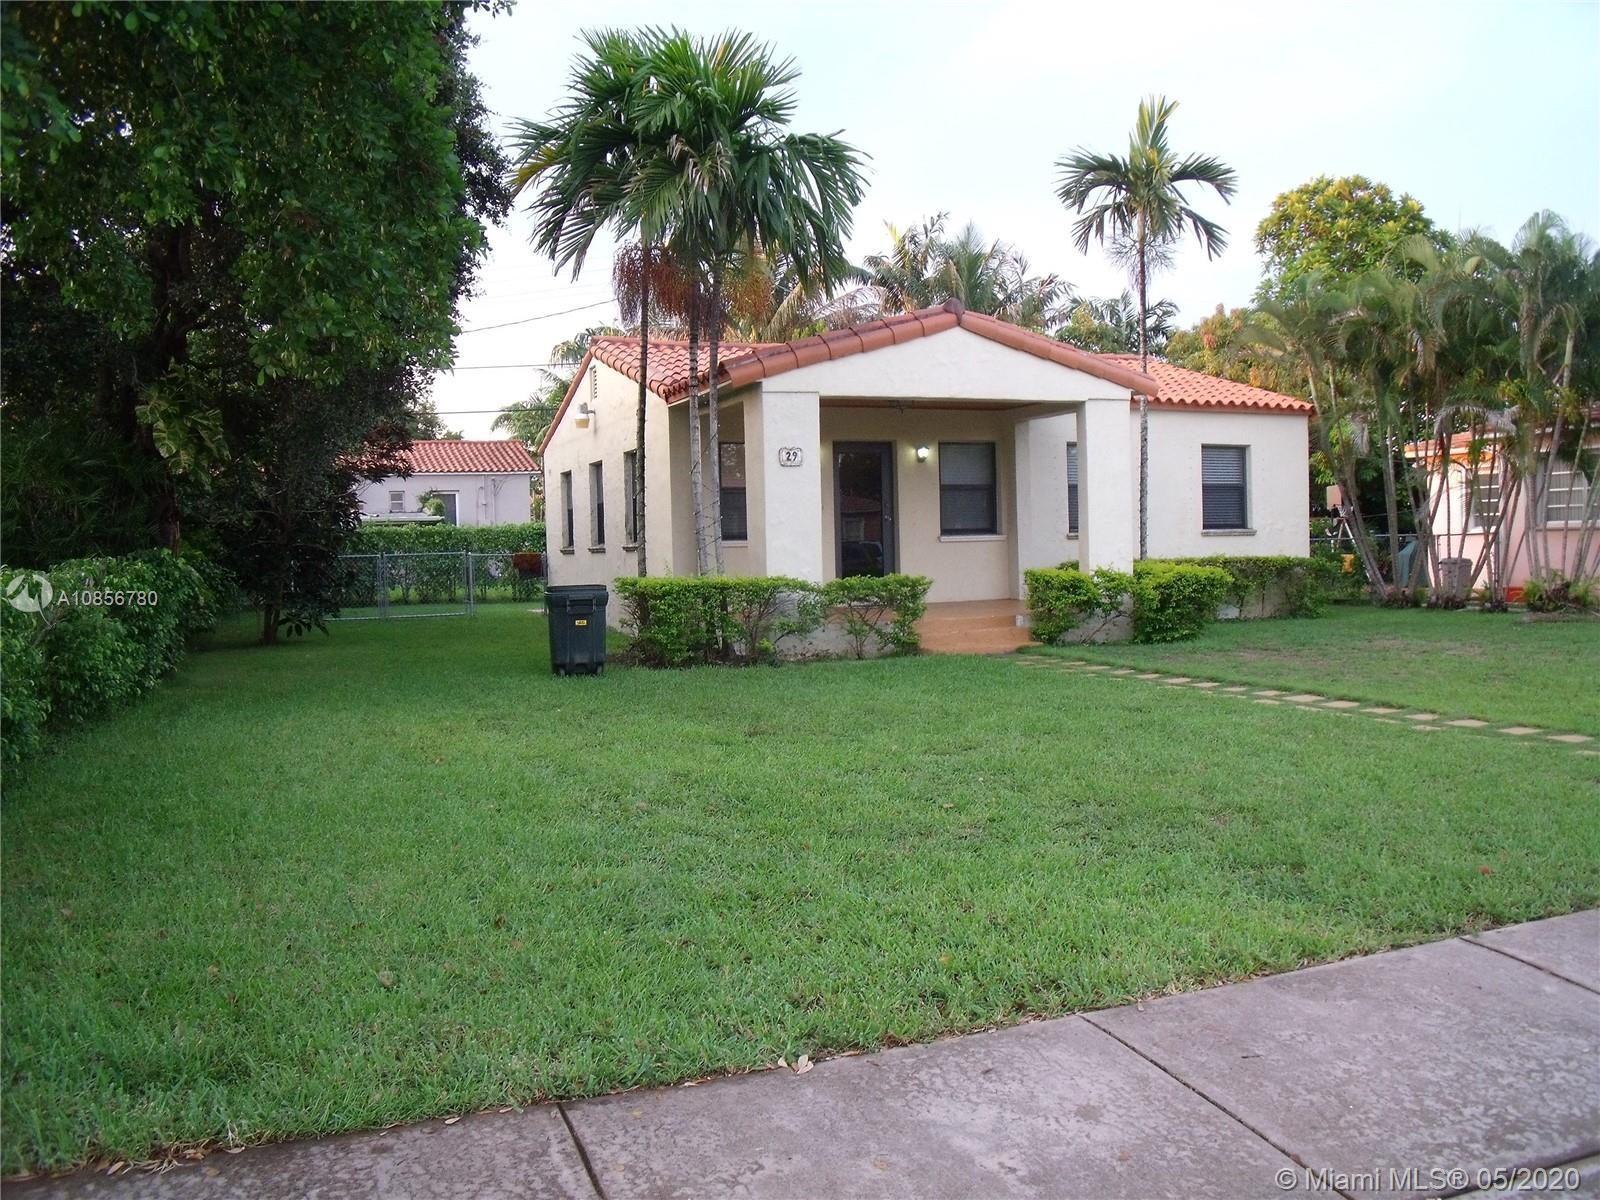 29 Alcantarra Ave, Coral Gables, Florida 33134, 2 Bedrooms Bedrooms, ,2 BathroomsBathrooms,Residential,For Sale,29 Alcantarra Ave,A10856780